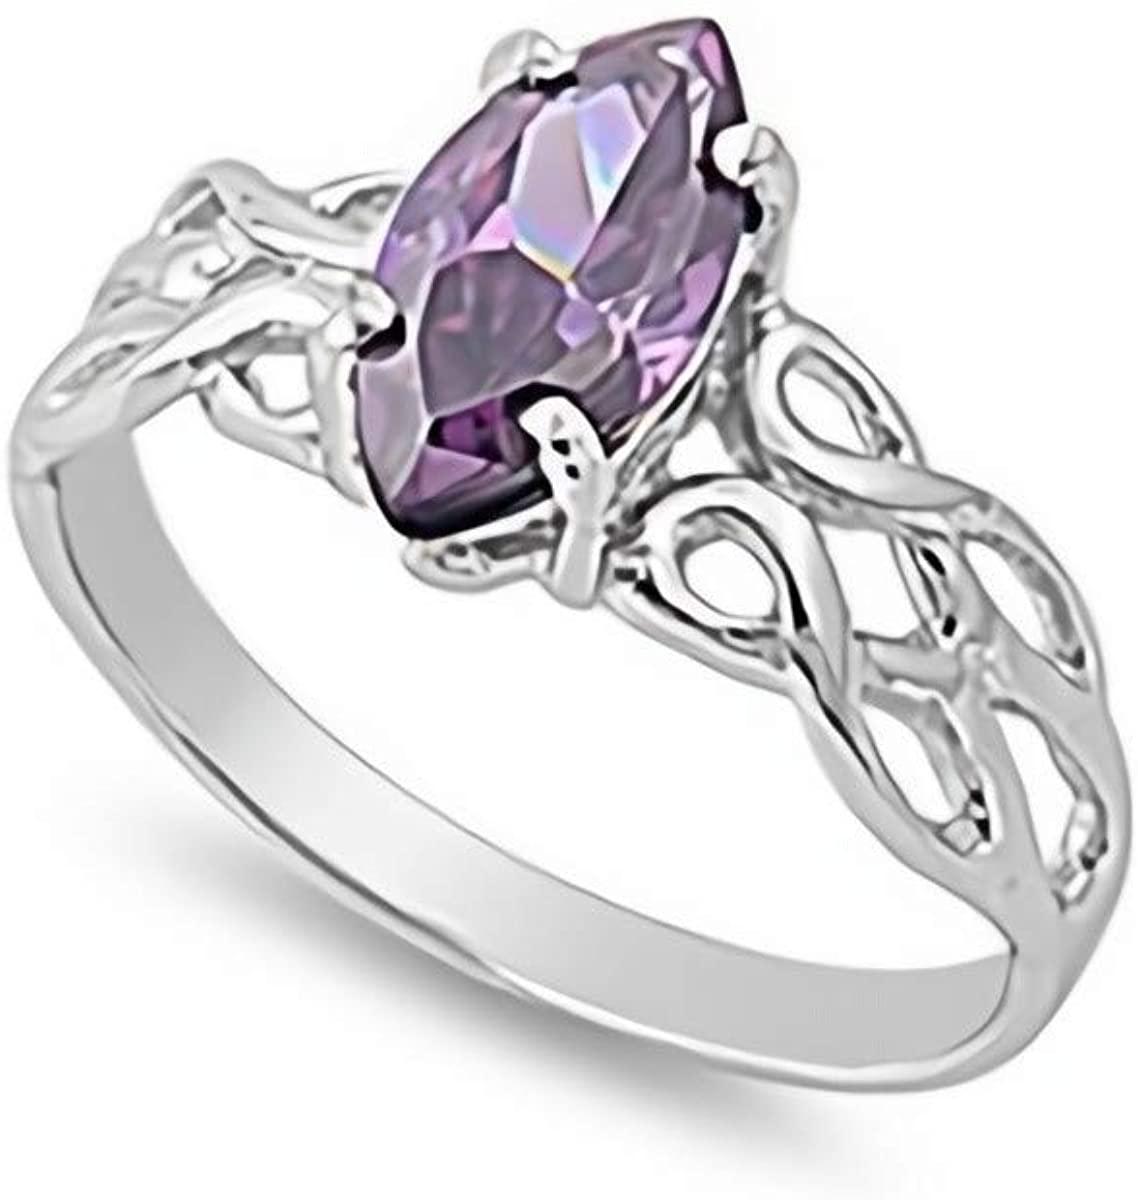 Glitzs Jewels 925 Sterling Silver CZ Ring (purple/Celtic)   Cubic Zirconia Jewelry Gift